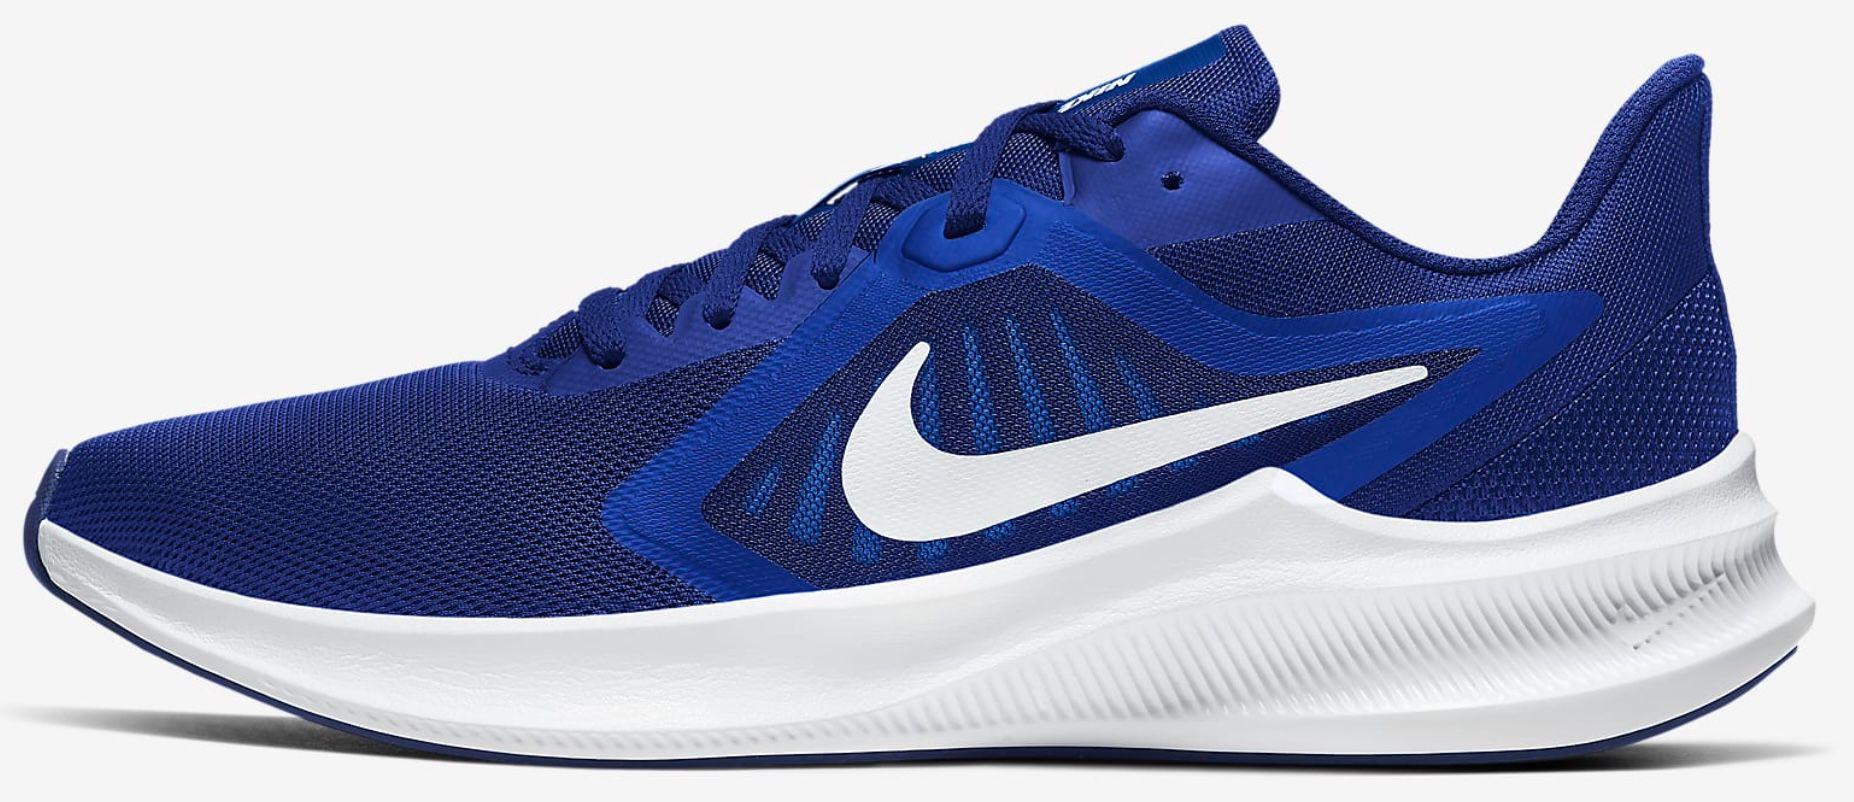 Nike Downshifter 10 Laufschuhe für 40,78€ (statt 49€)